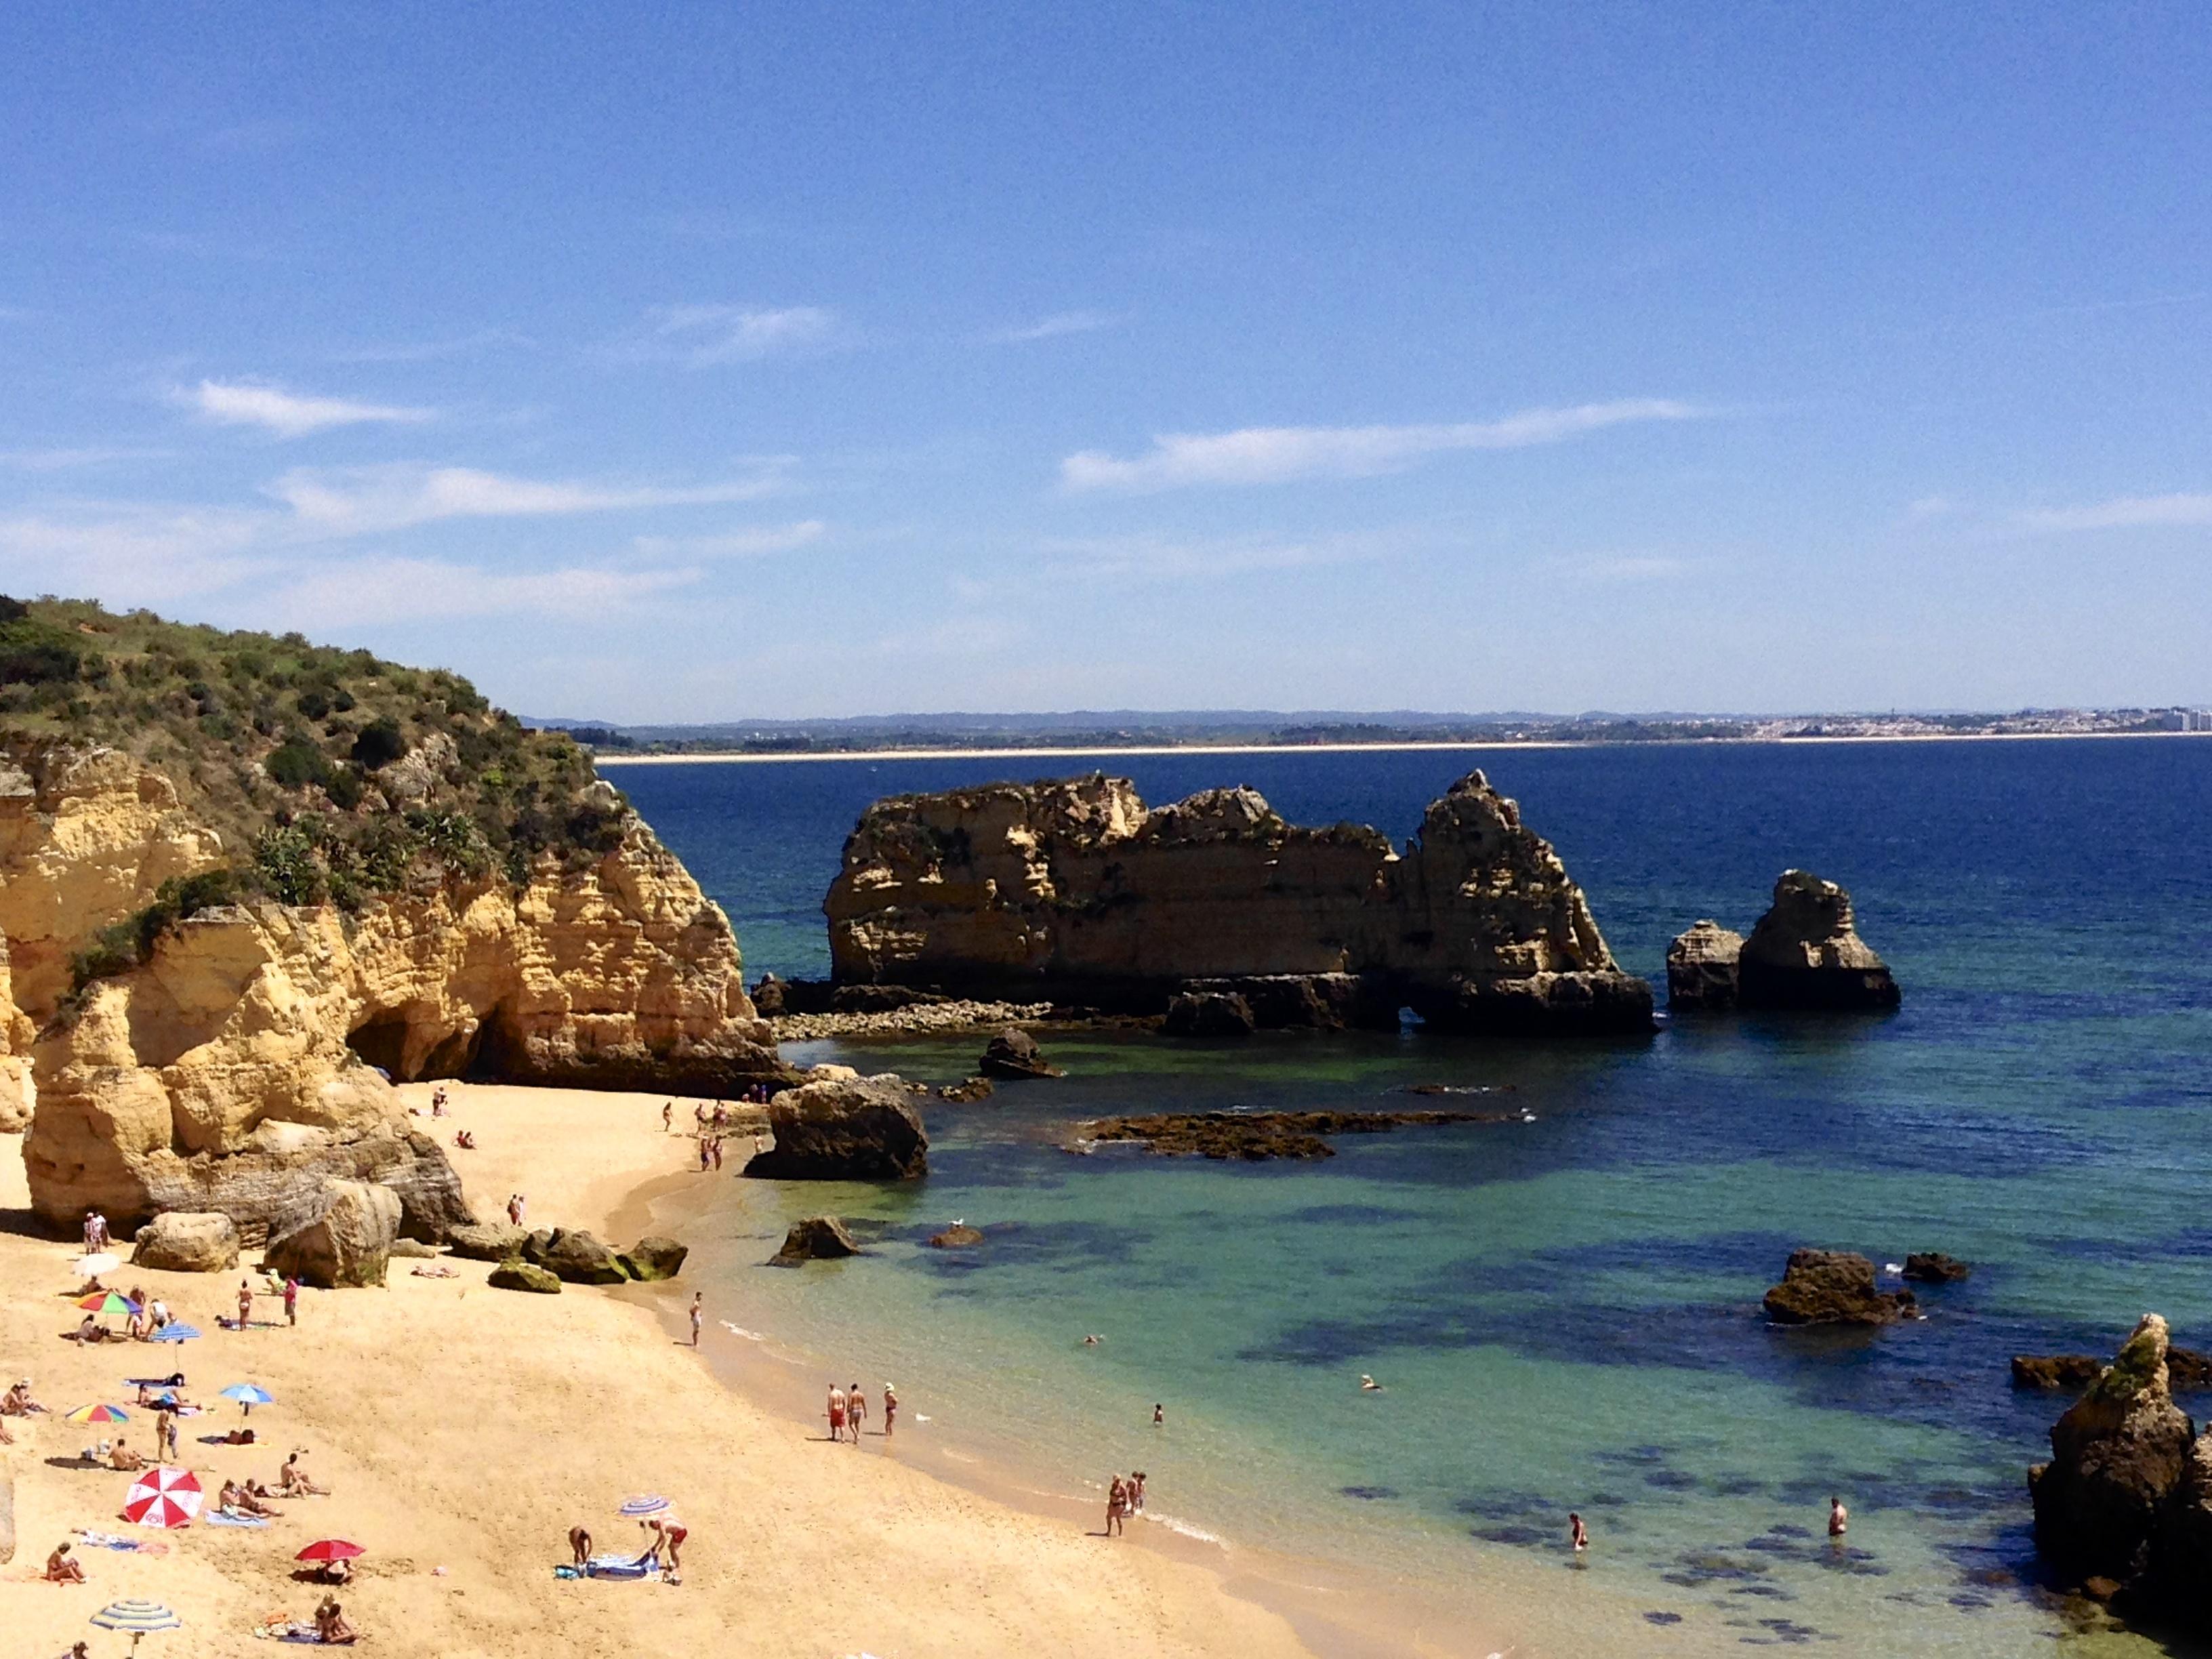 Praia Dona Ana - Algarve, Portugal